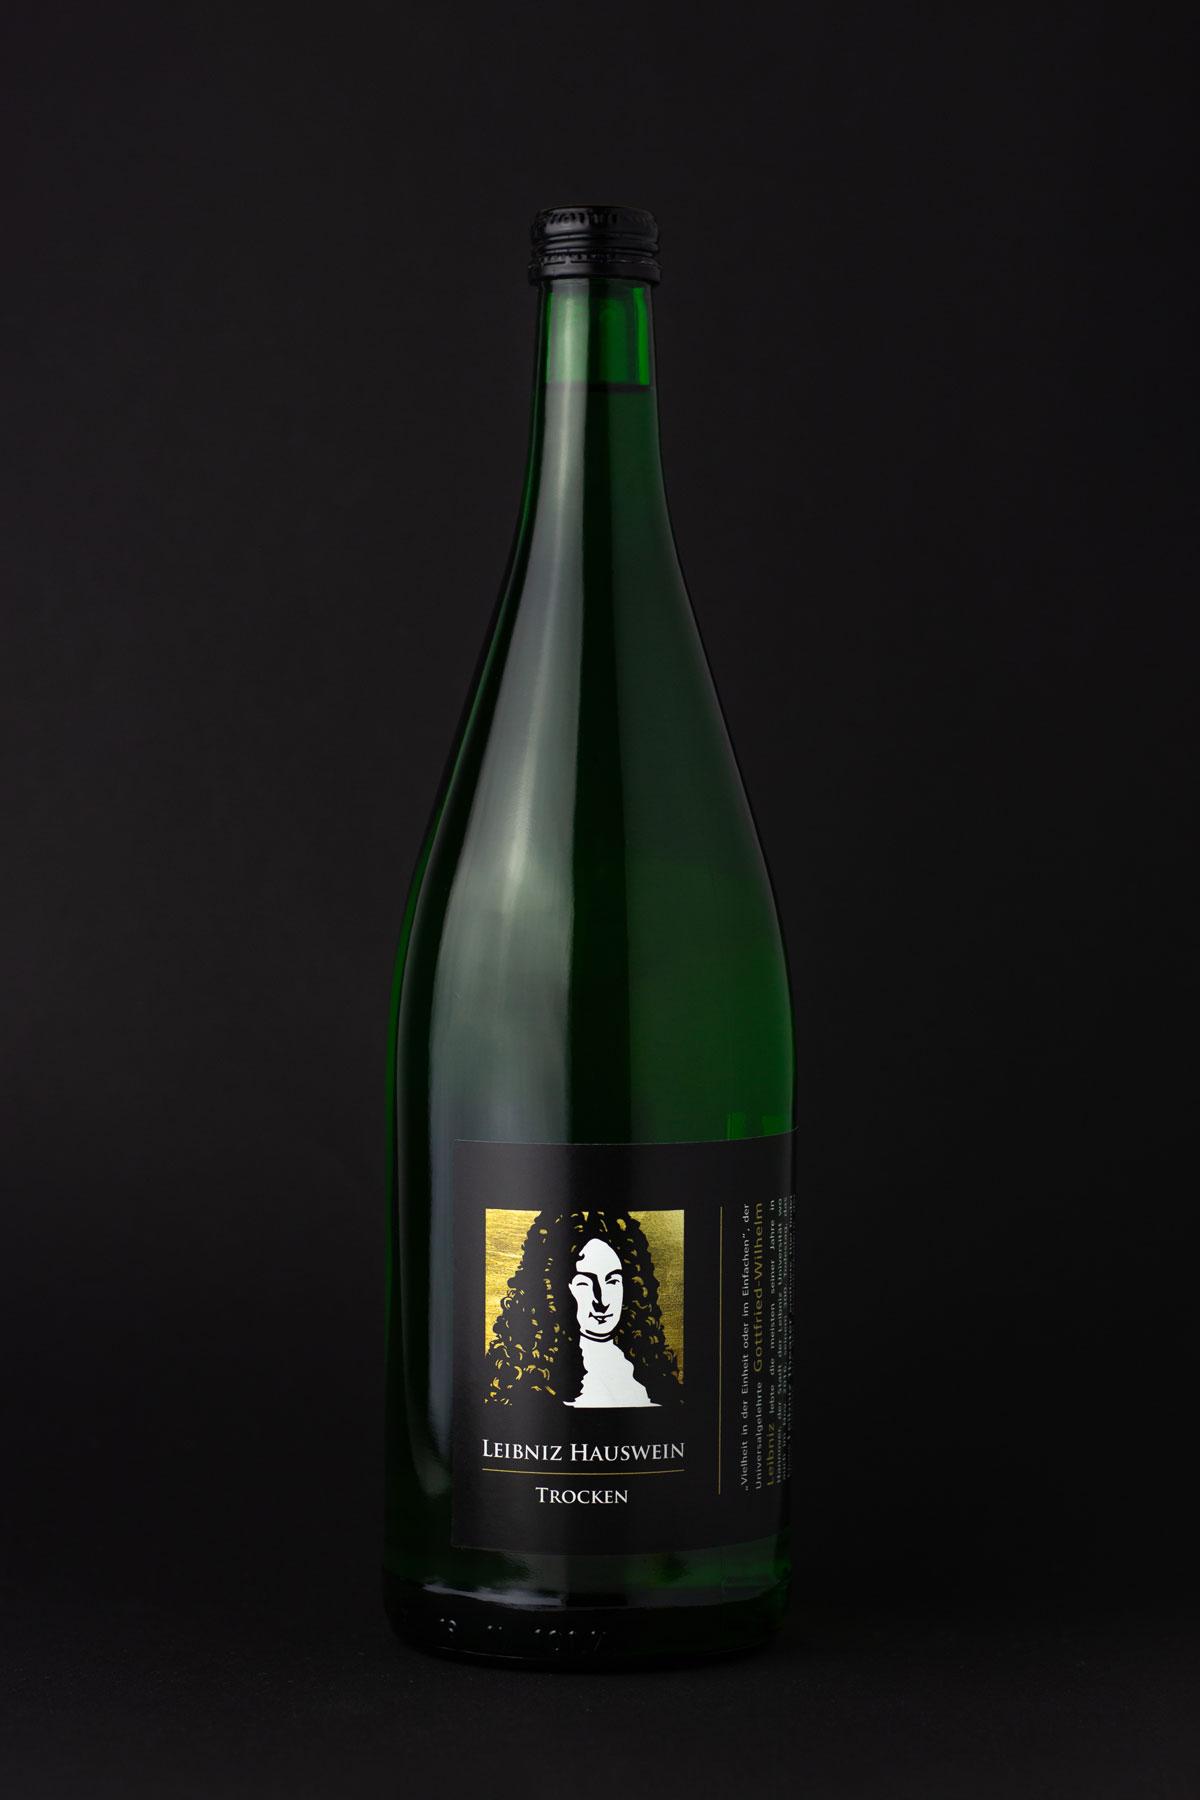 Leibniz Hauswein